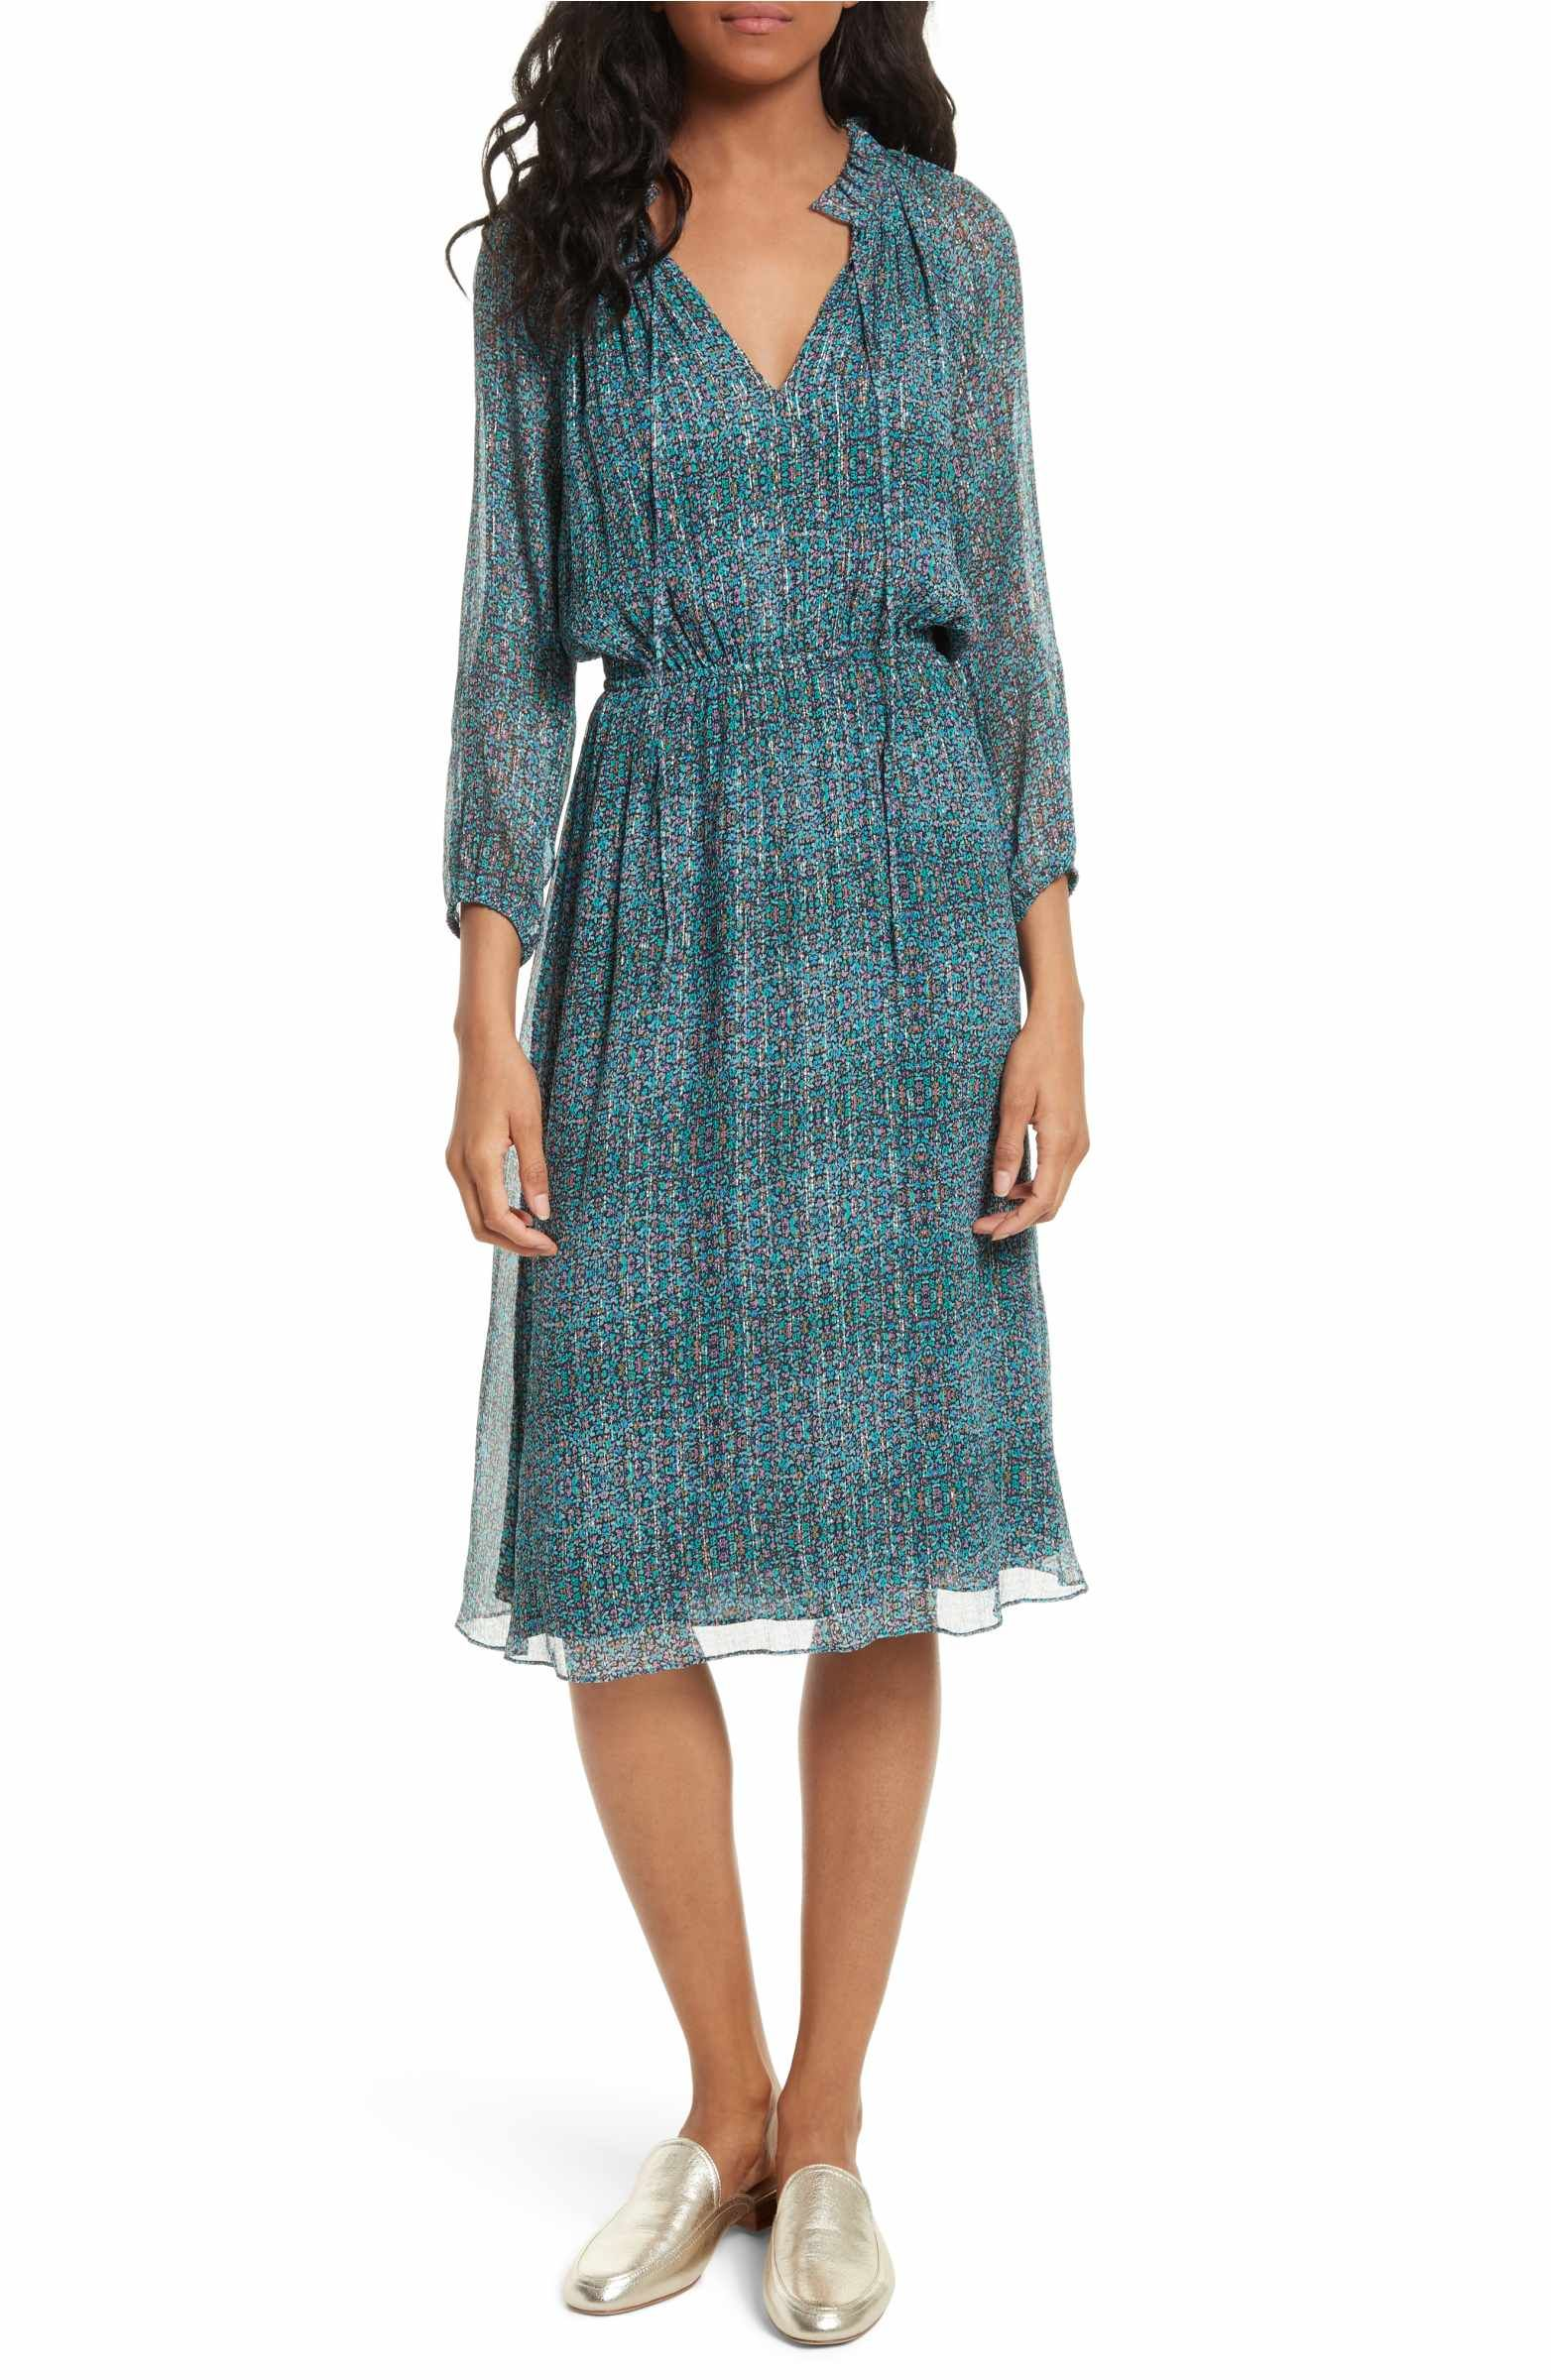 Main image rebecca taylor minnie floral chiffon dress clothes